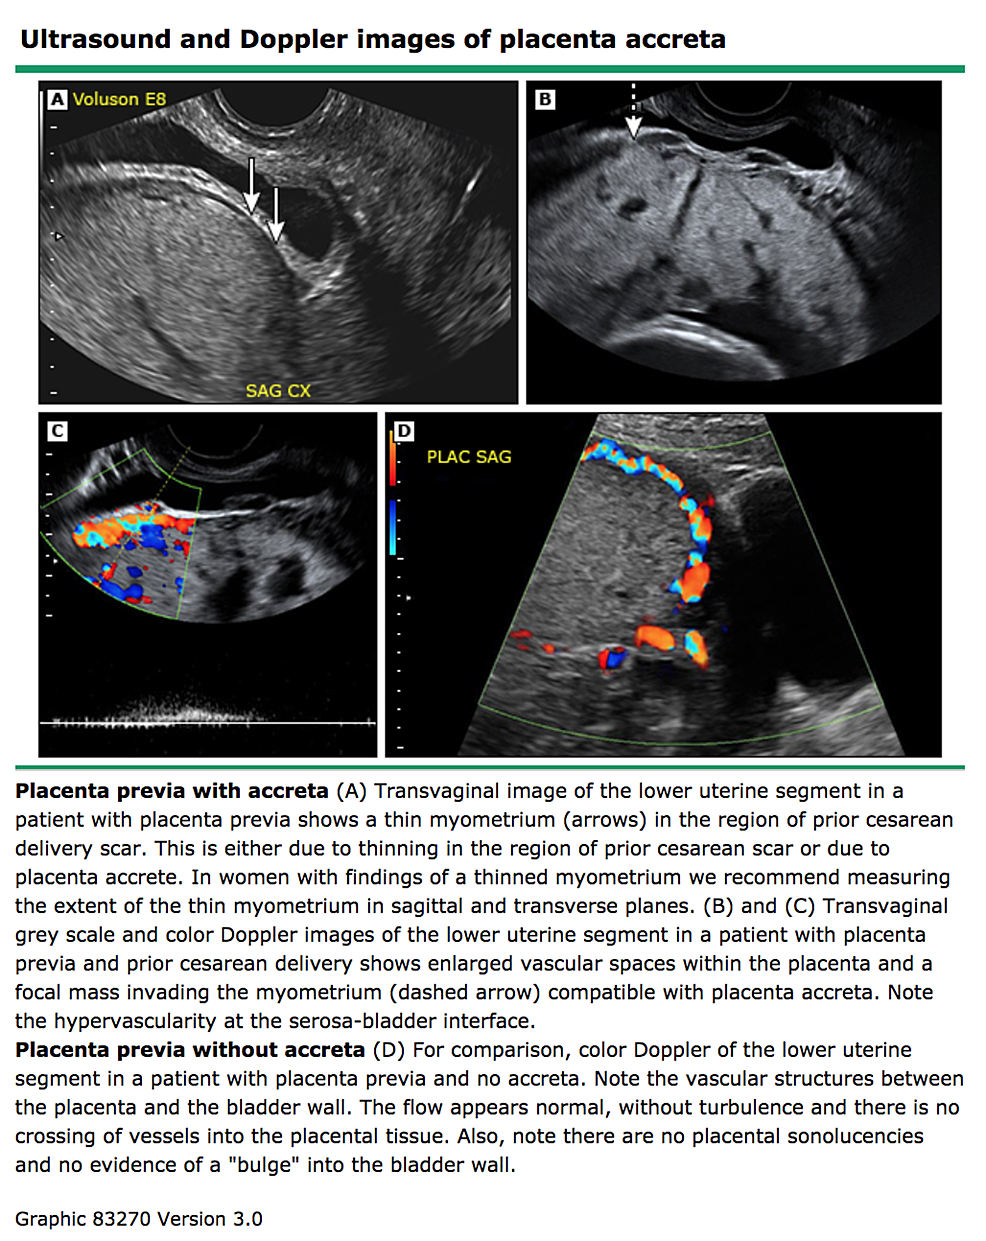 Ultrasound-and-Doppler-images-of-placenta-accreta.